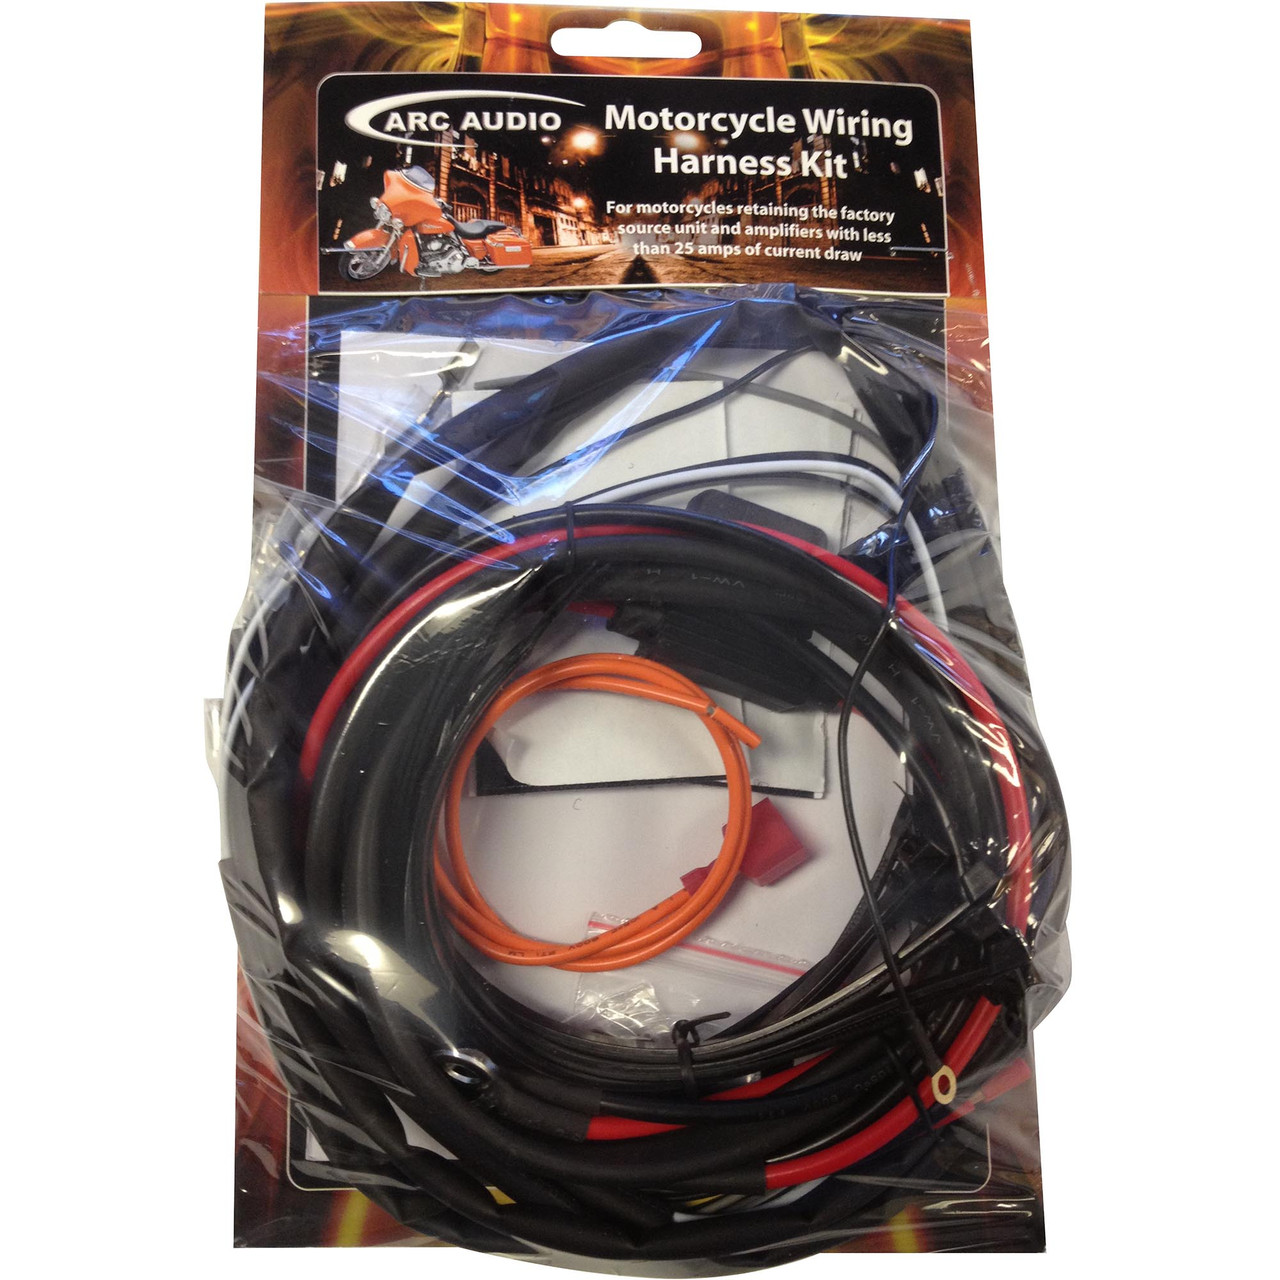 small resolution of home wiring dynamic audio video llc jamie gannon